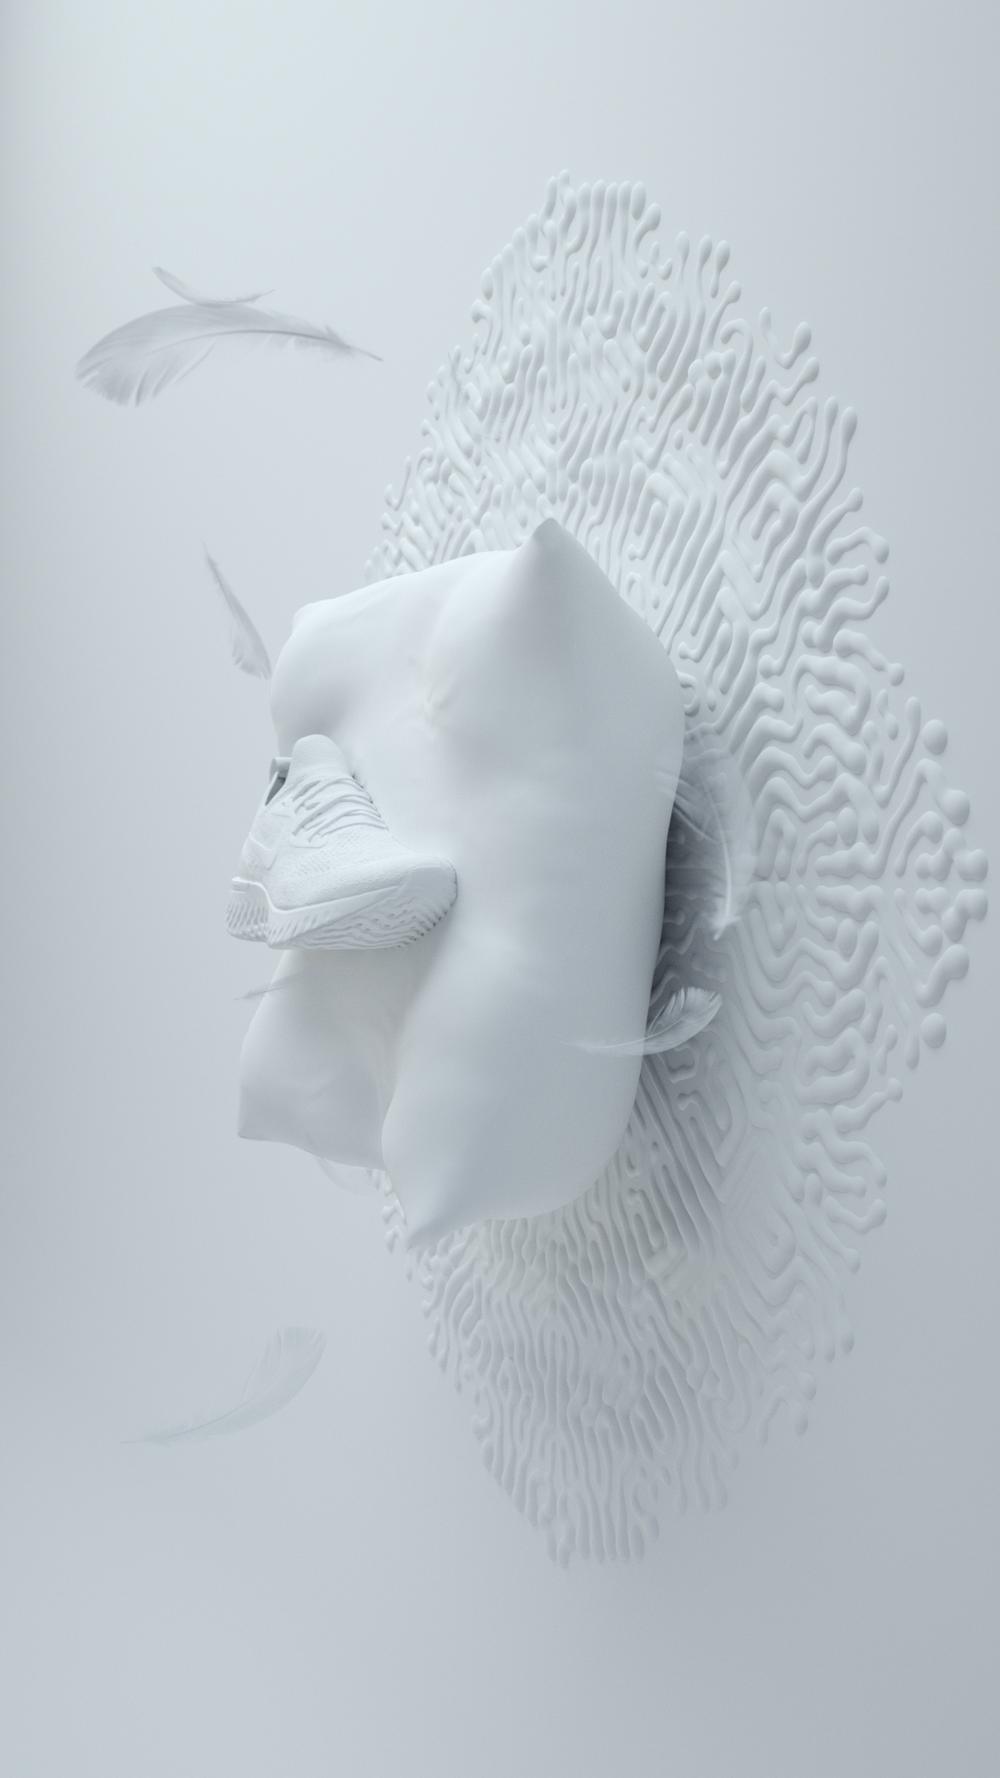 React_Diffusion_Wall_Still_001_Still_001B0105.png